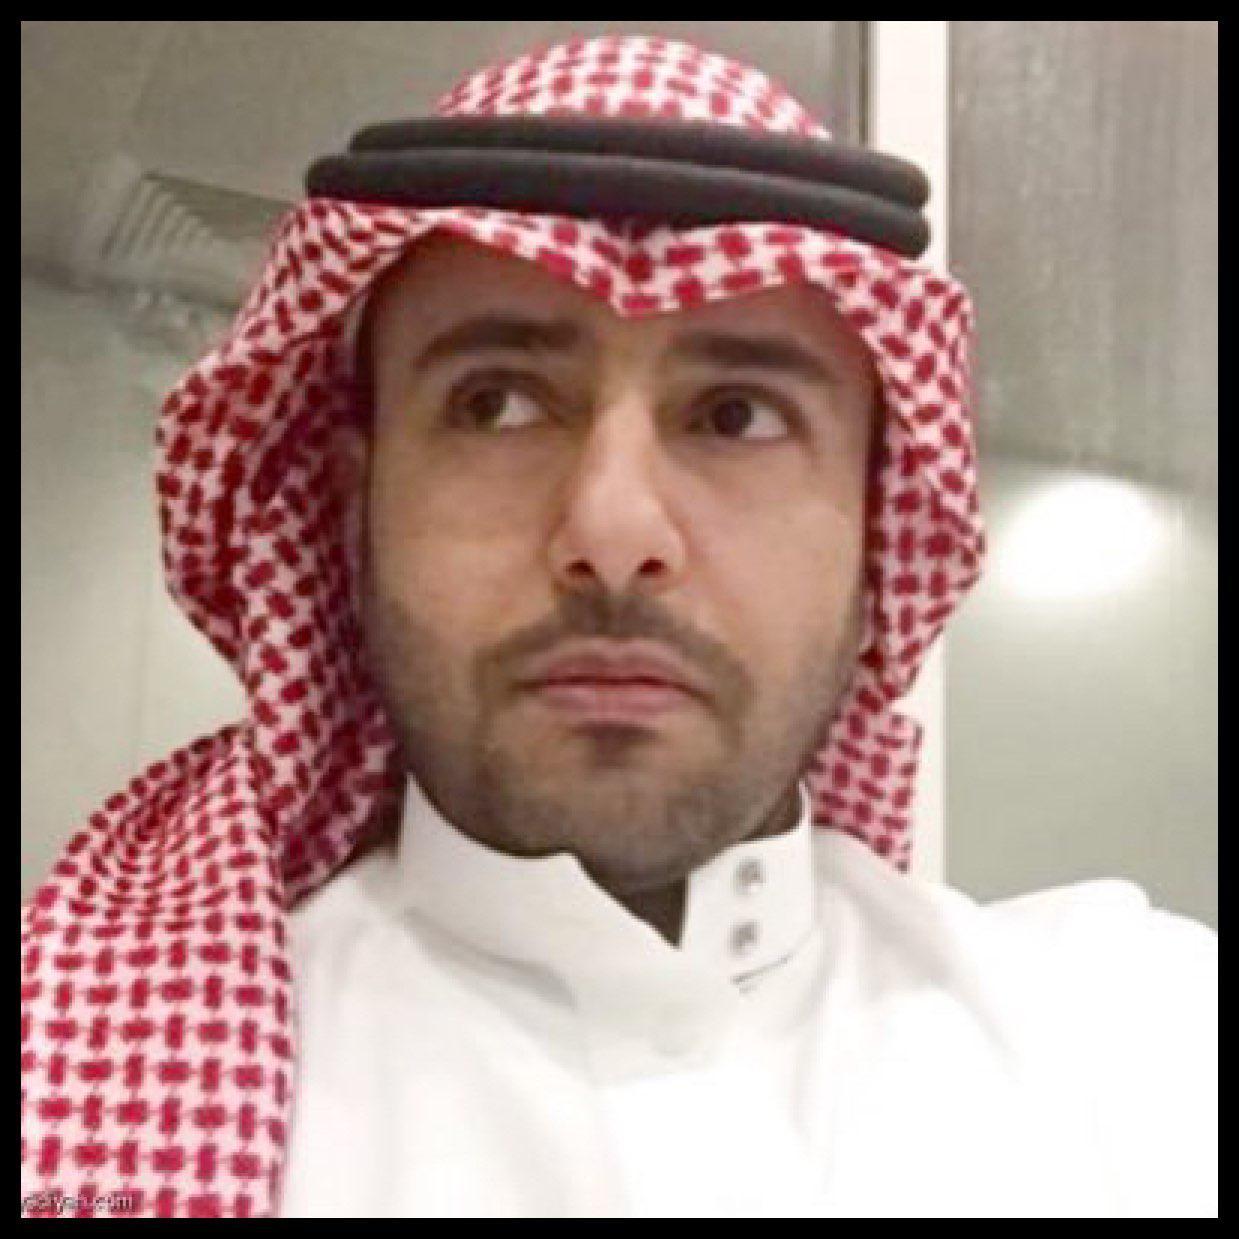 Ahmad Alajlan Clubhouse